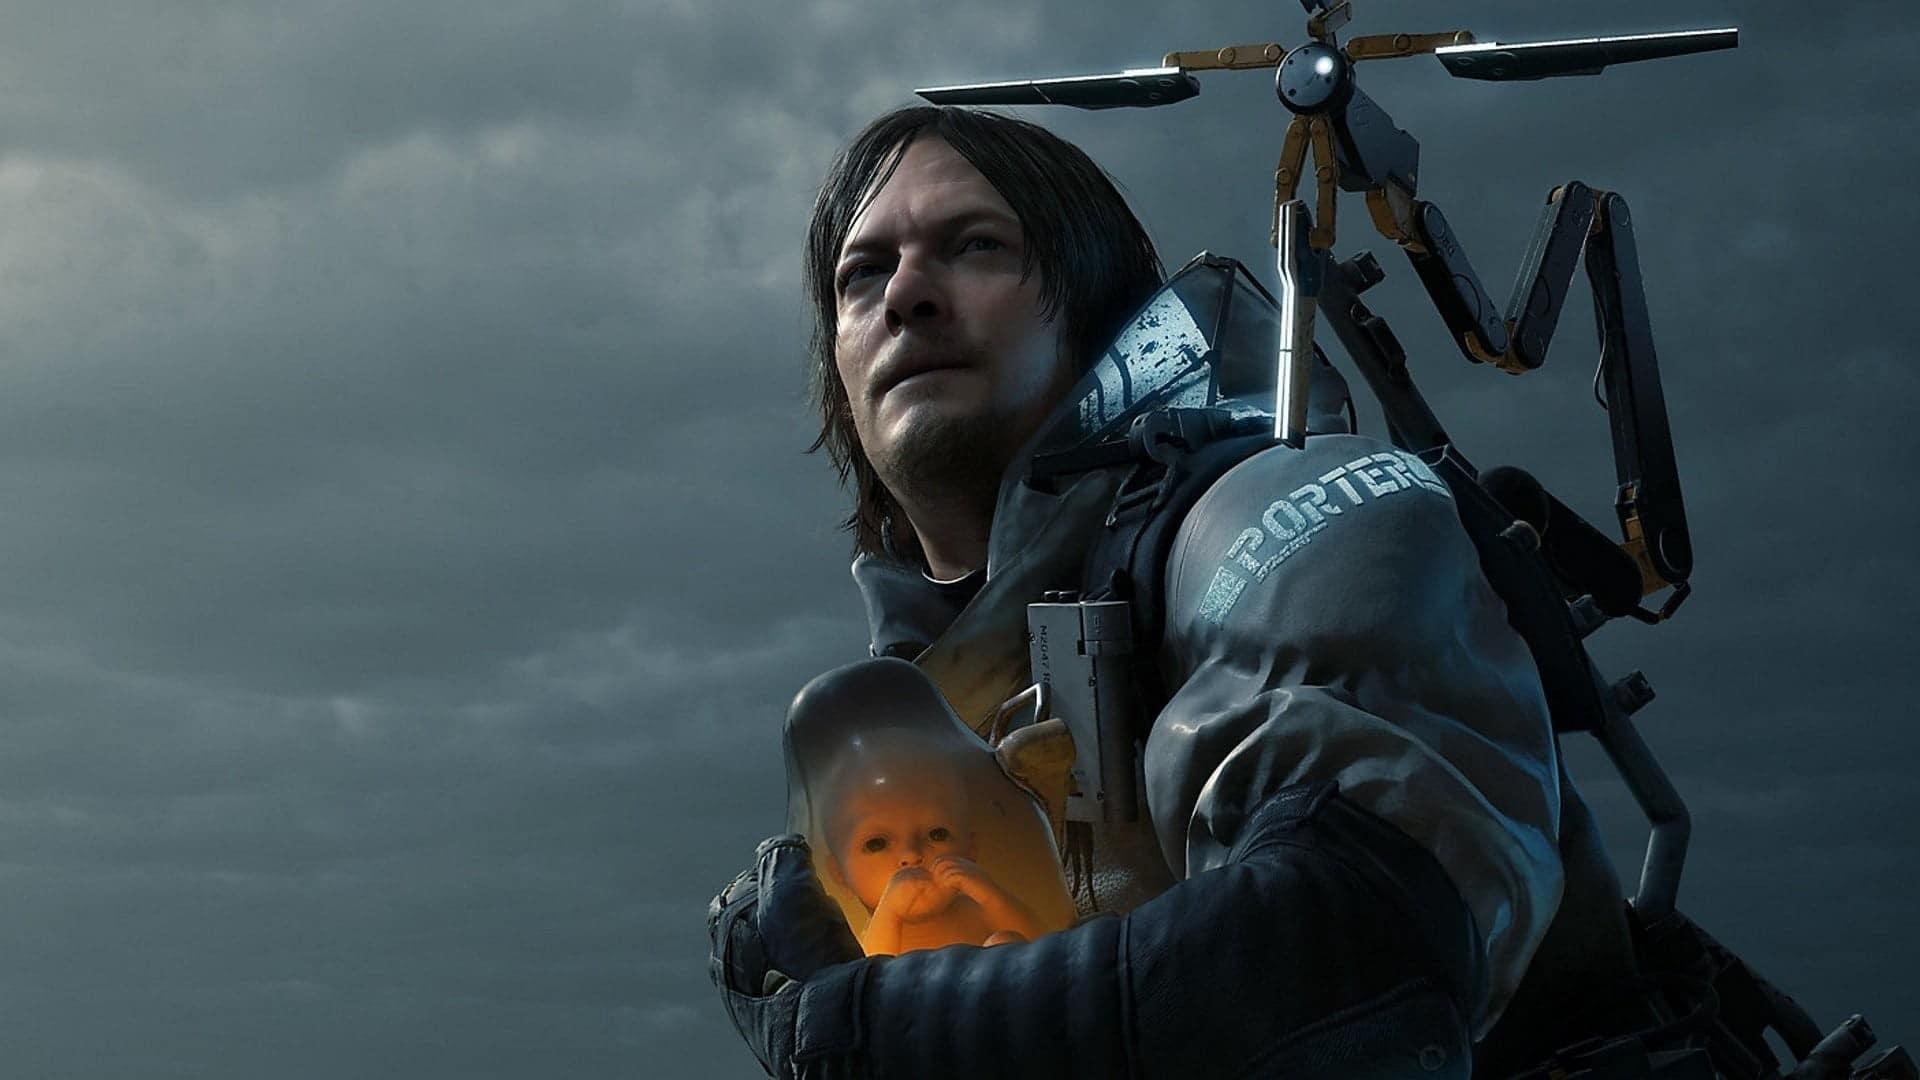 death stranding director's cut - PS5 - GamersRD